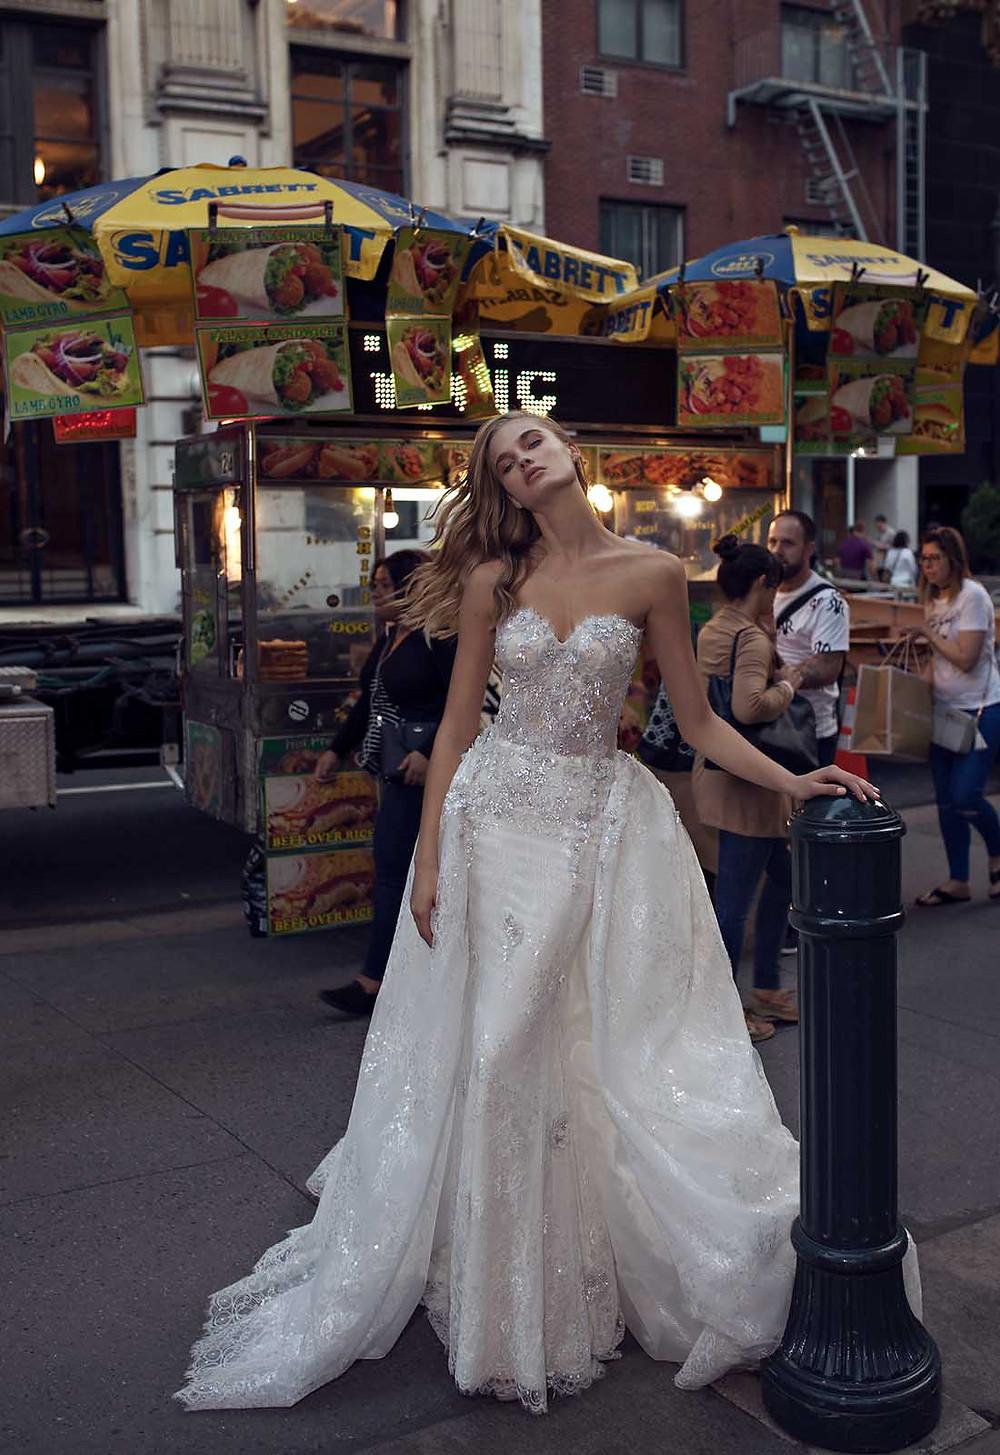 Weddinspired | 50+ Detachable Skirt Wedding Dresses | Pnina Tornai from the Dream collection